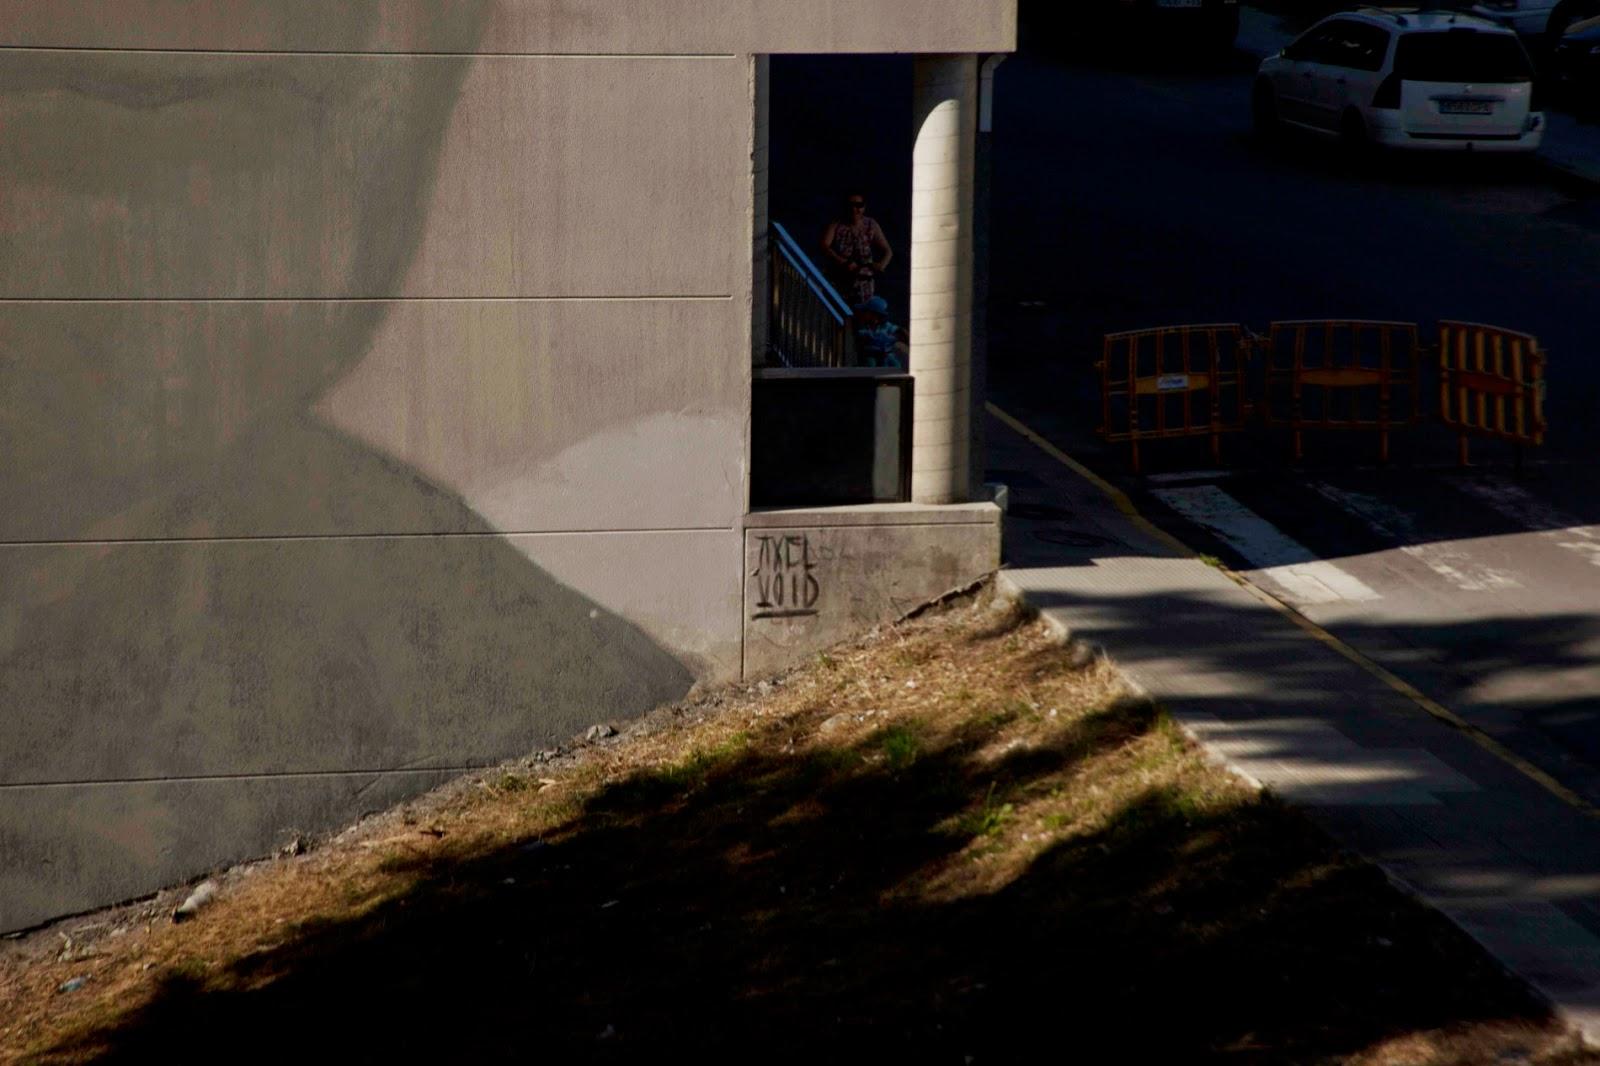 axel-void-new-mural-for-desordes-creativas-2014-05